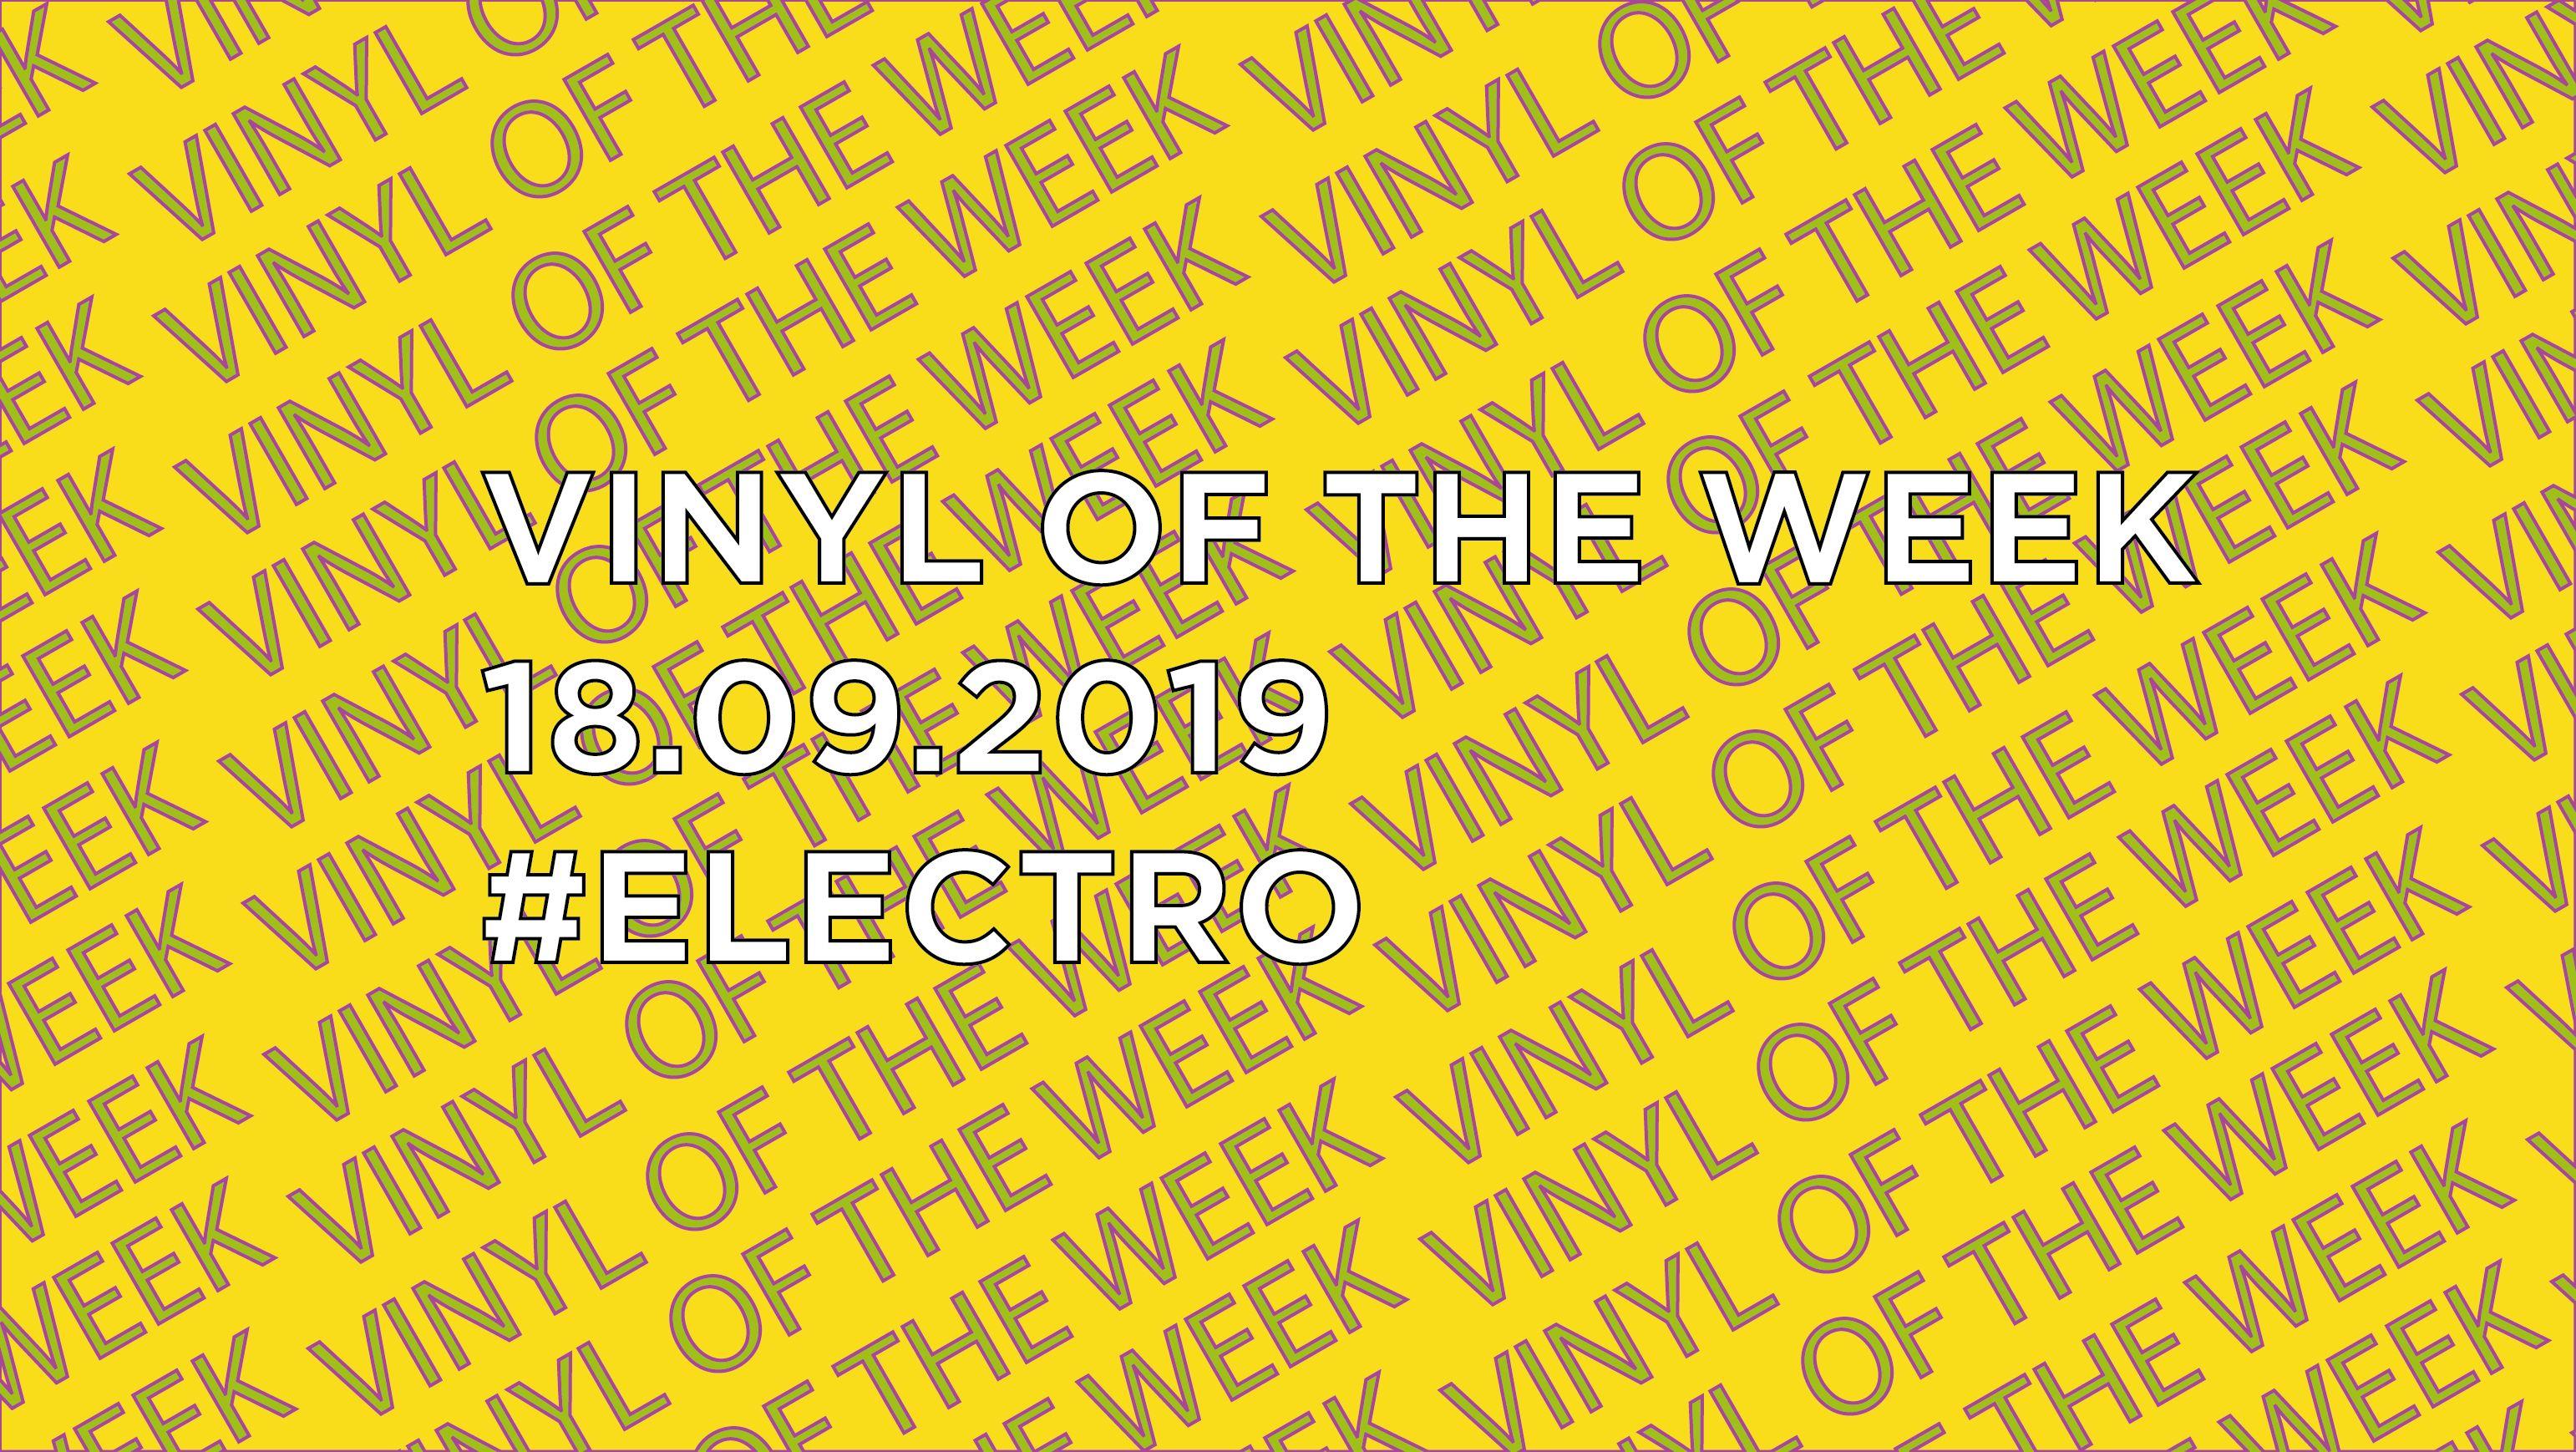 Vinyl records of the Week 09.18.2019